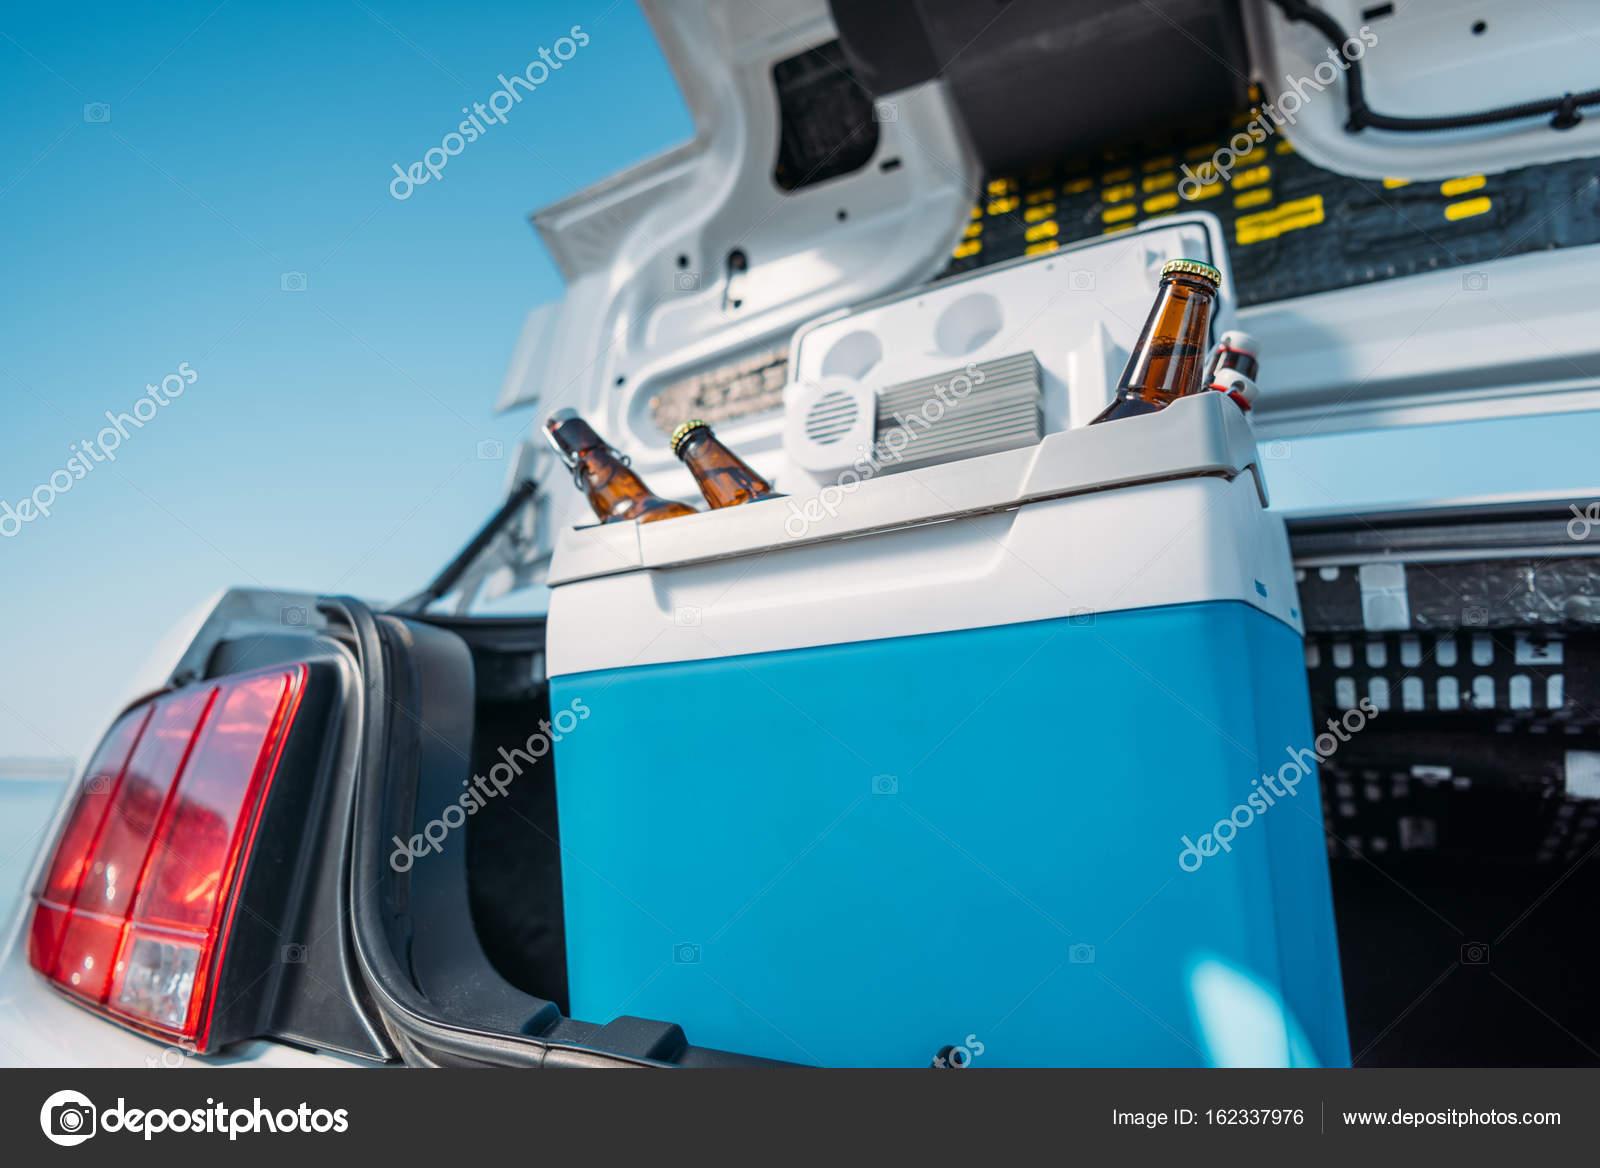 Kühlschrank Transport Auto : Tragbarer kühlschrank mit bier im auto u stockfoto